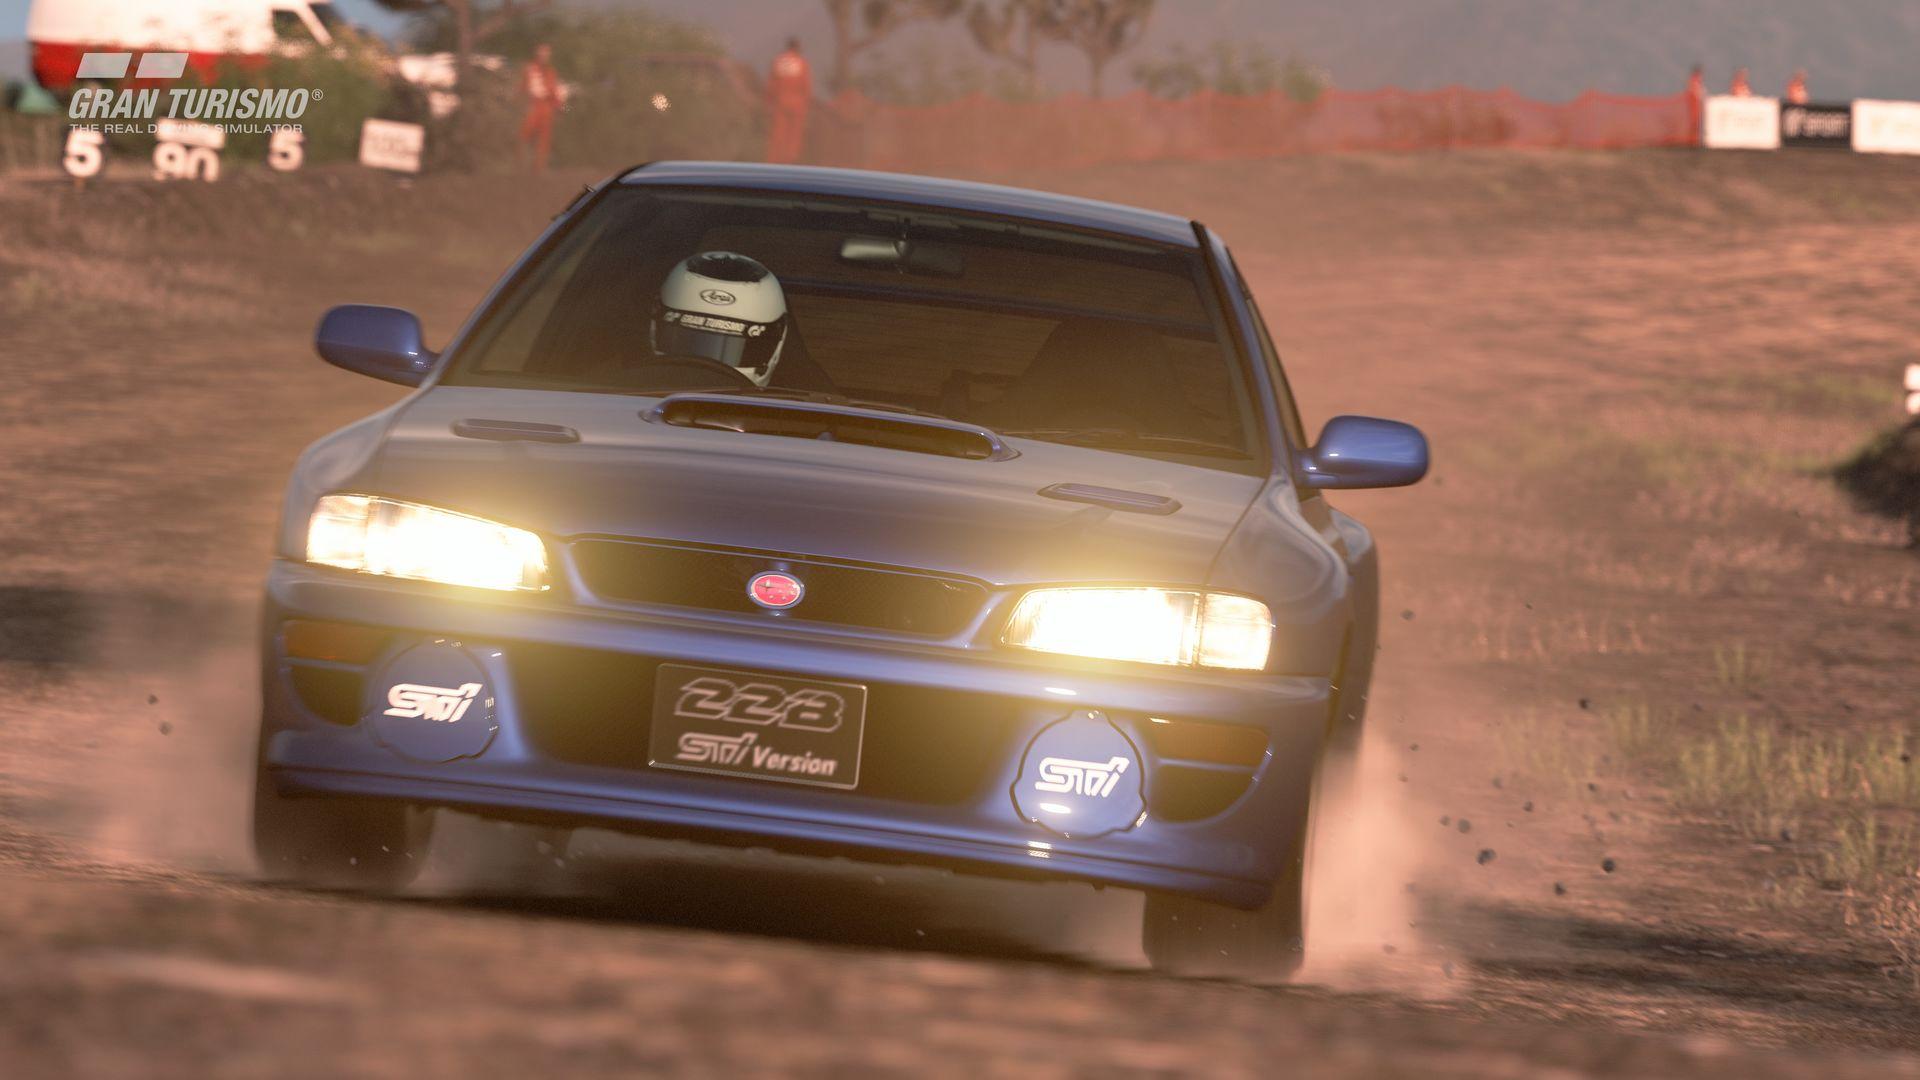 Gran Turismo Sport November Update Subaru Impreza 22B-STi Version '98 (N300) 2